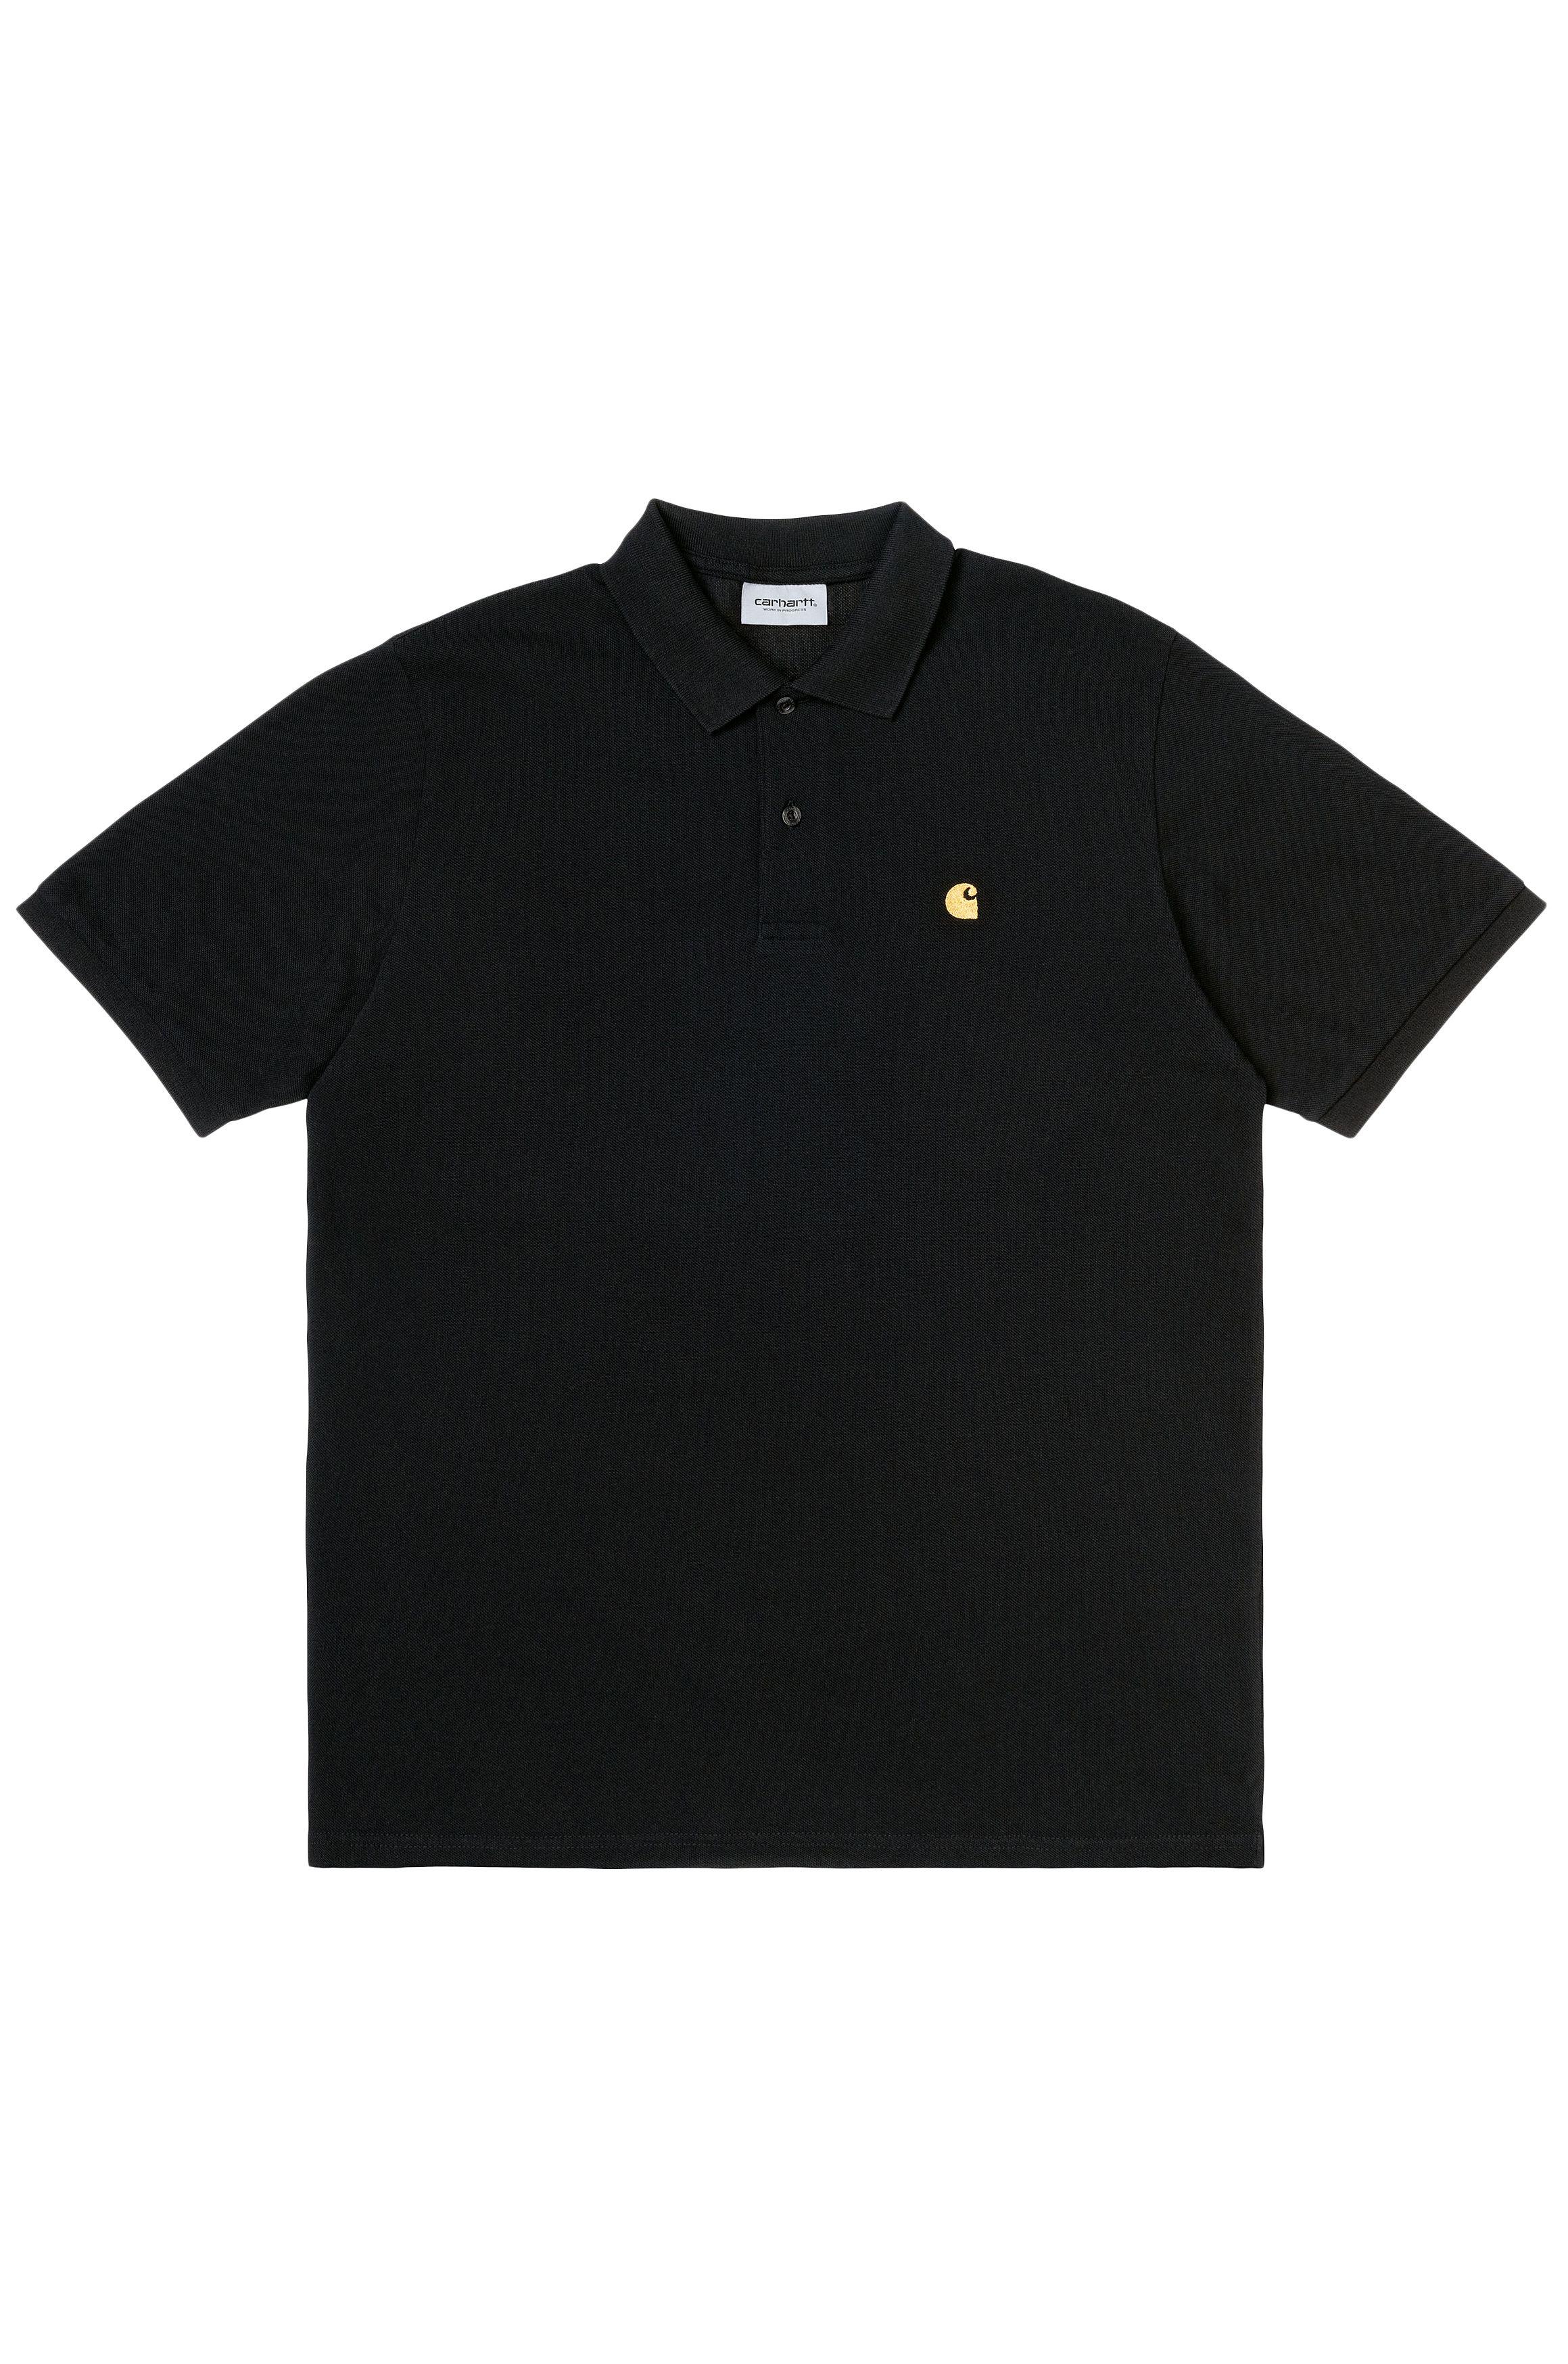 Carhartt WIP Polo    S/S CHASE PIQUE POLO Black/Gold